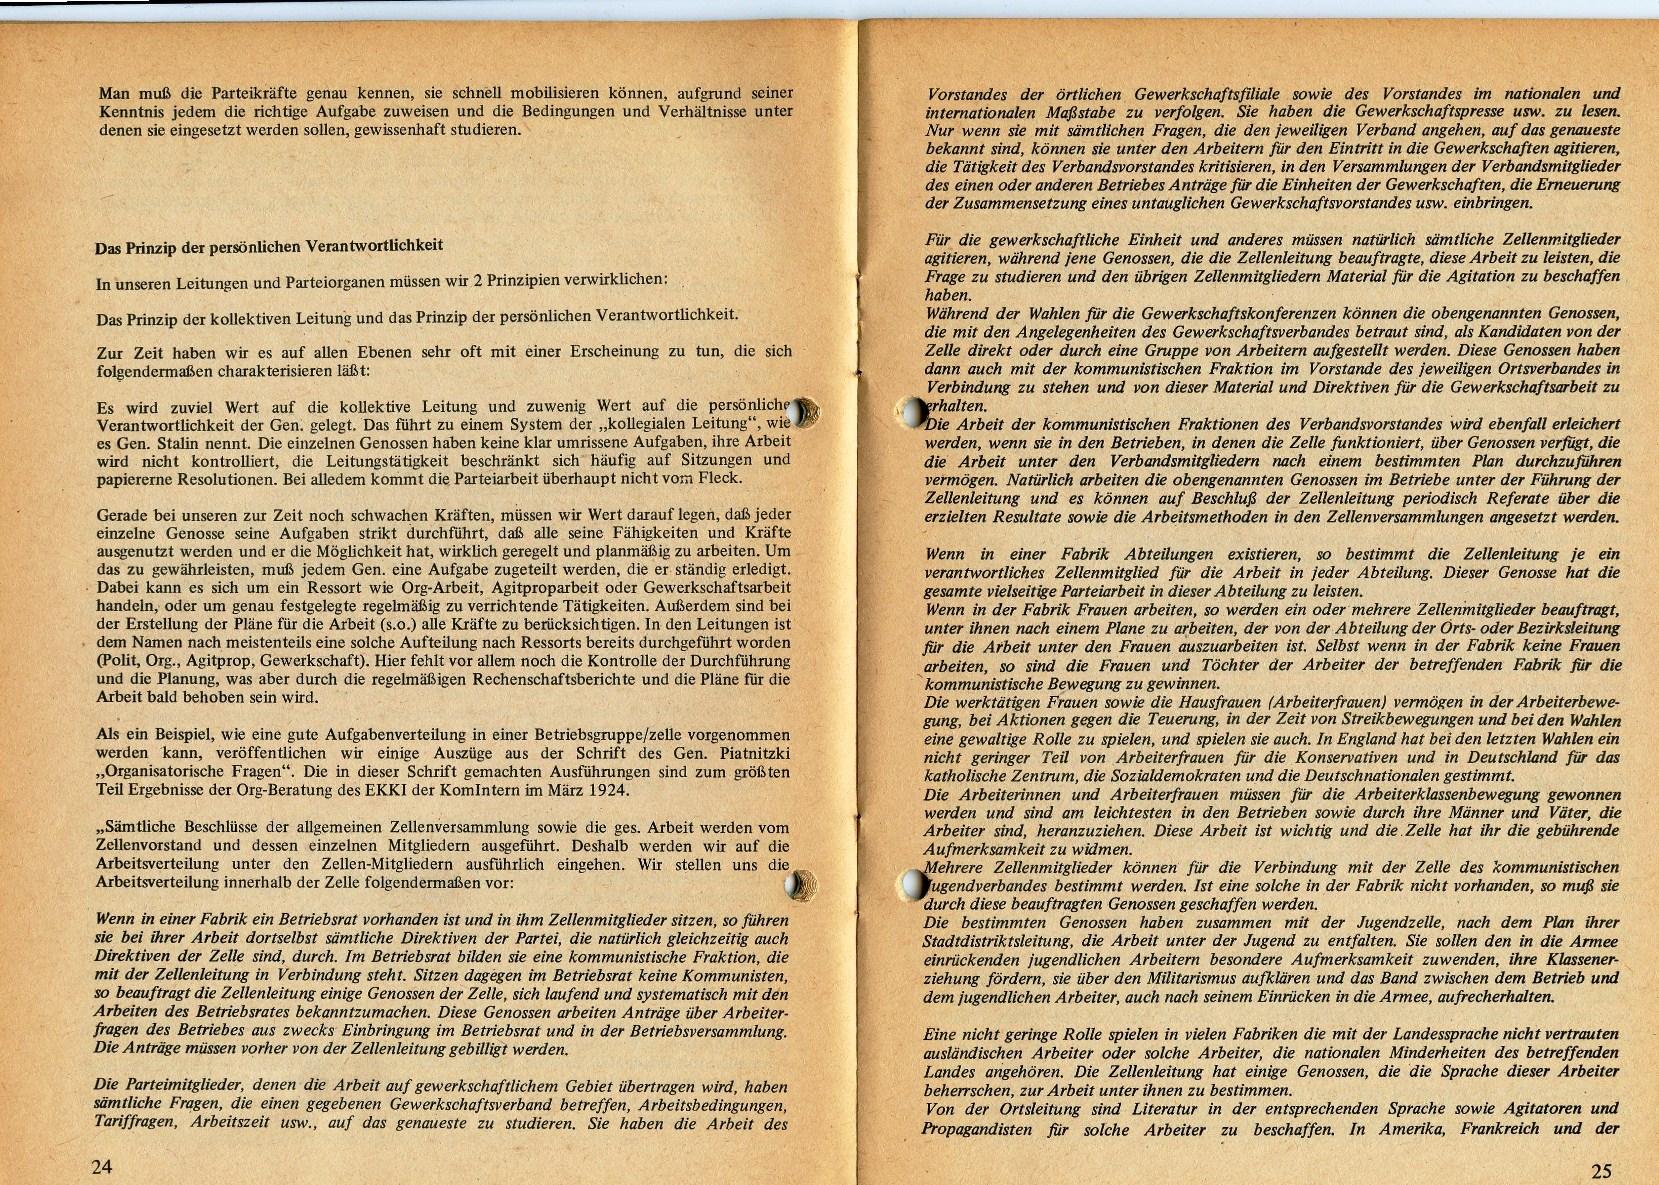 ZB_Parteiarbeiter_1970_02_14